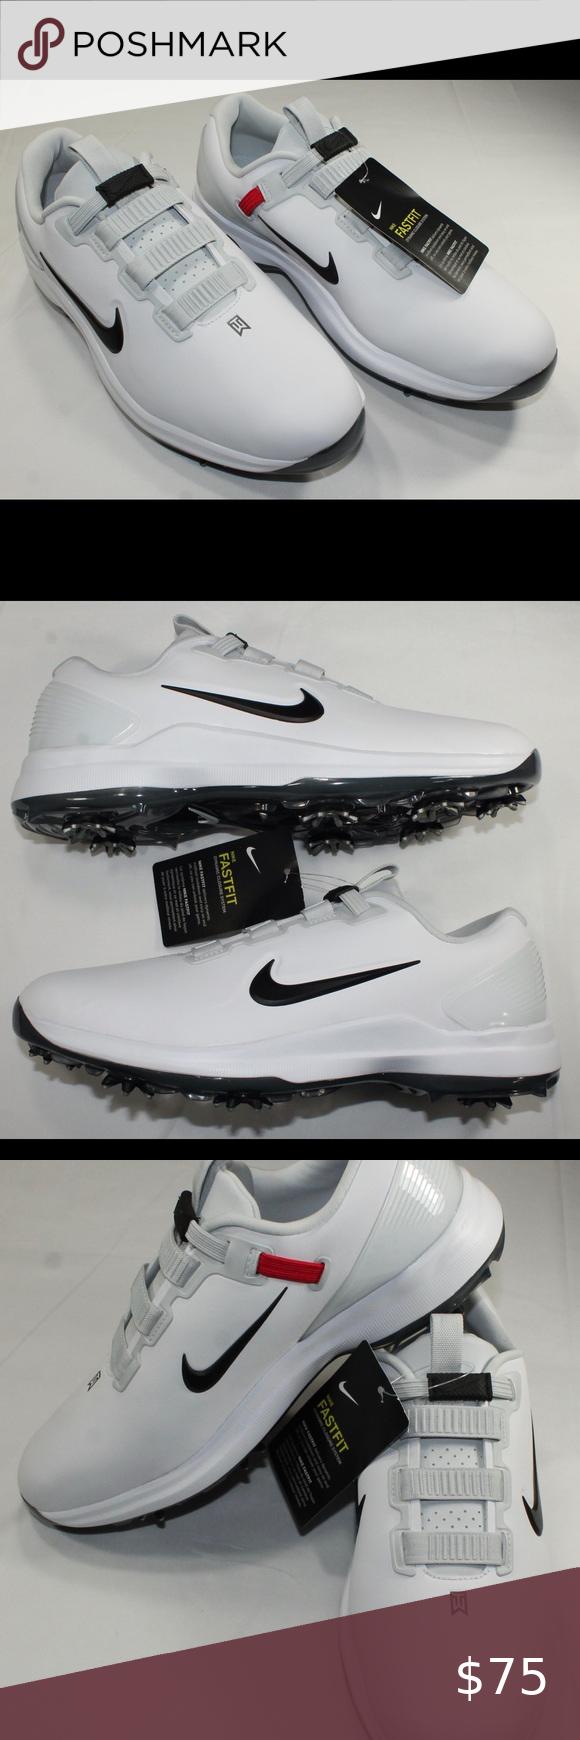 nike men's tw71 fastfit golf shoes